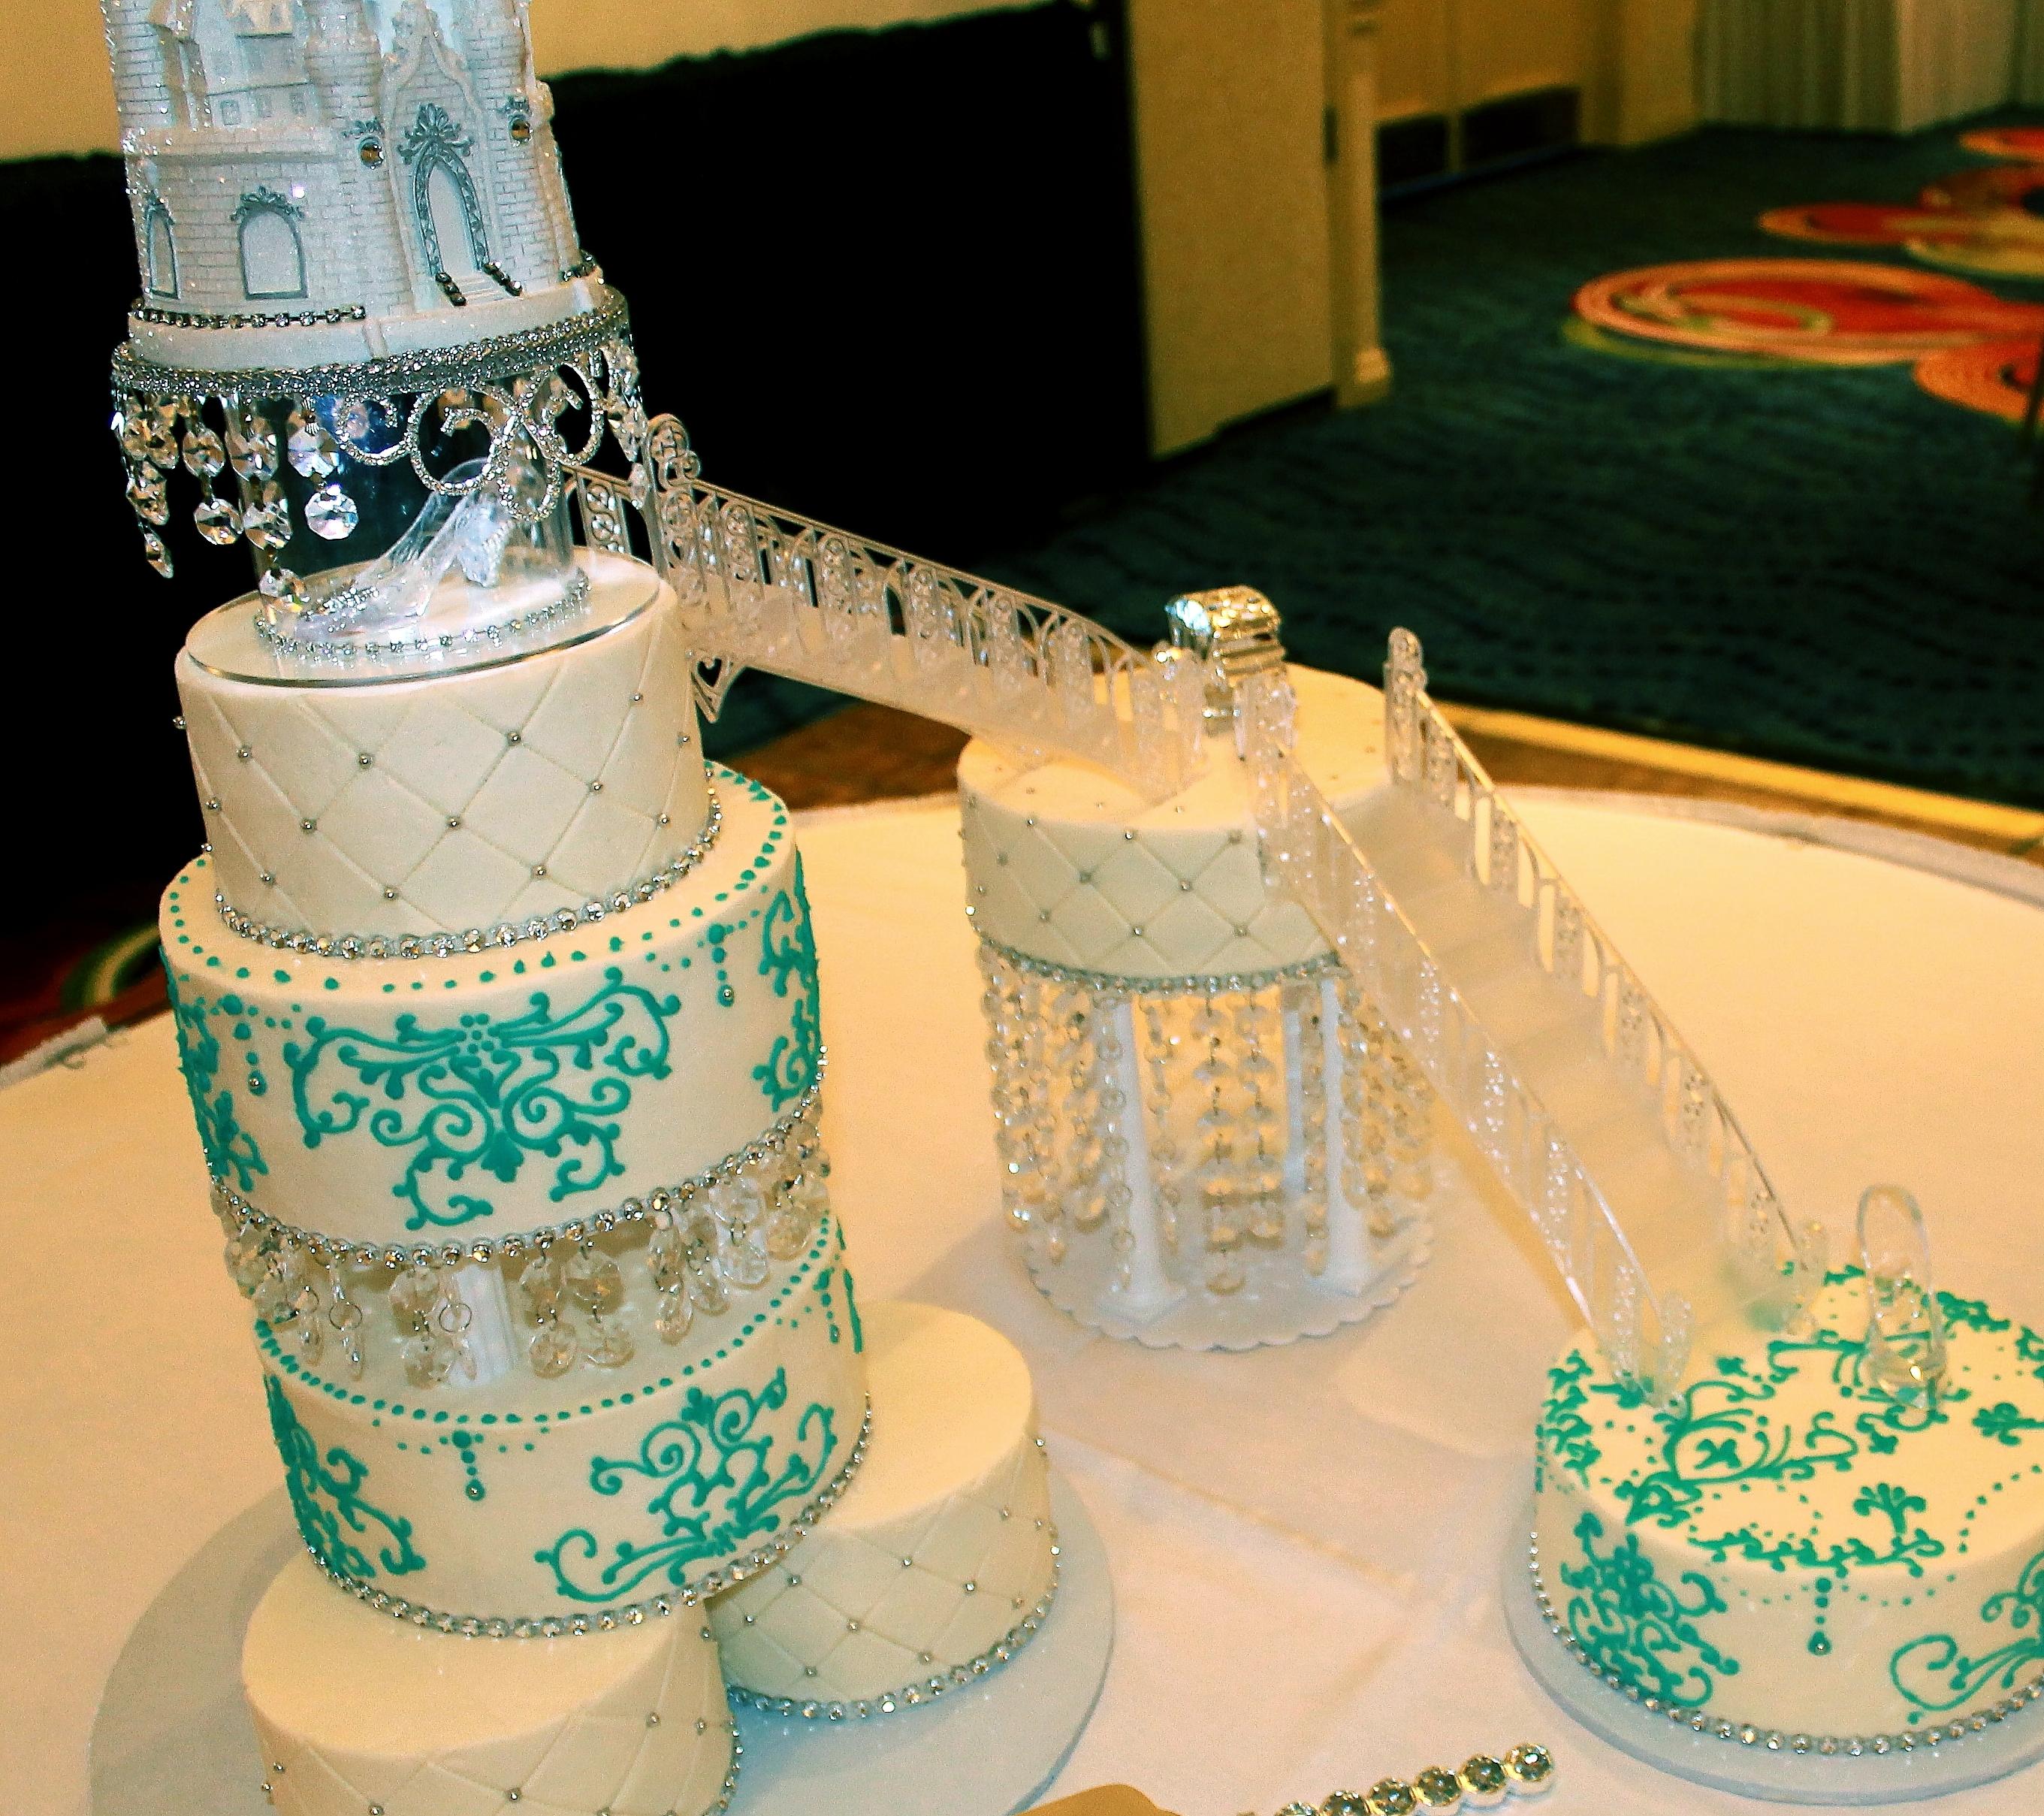 Princess Cake Wedding Cake Castle Cake Staircase Cake ...